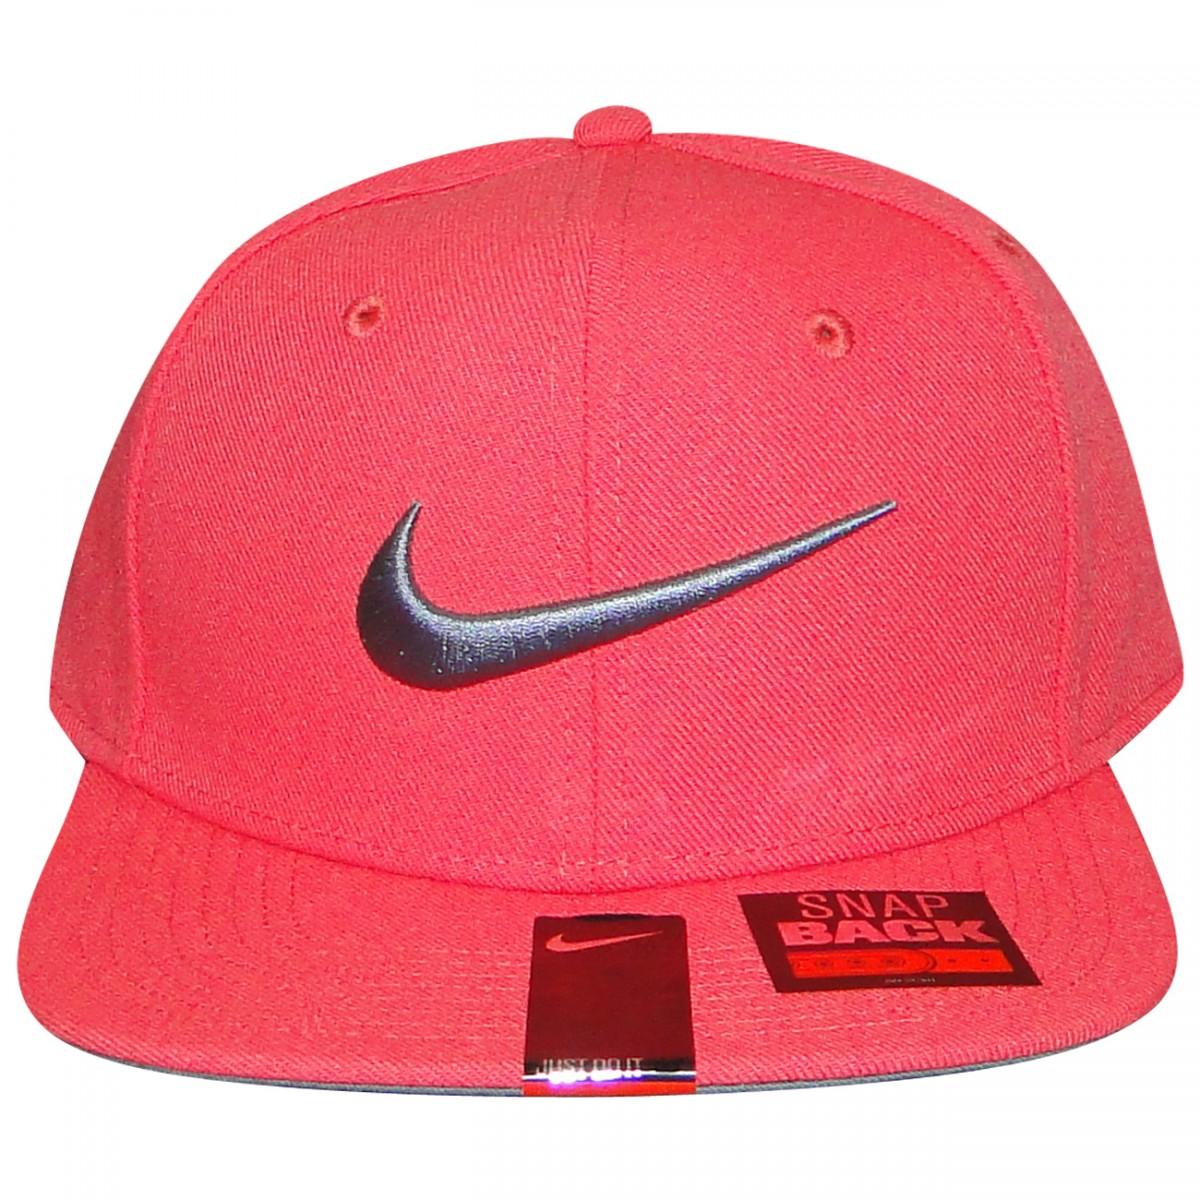 Bone Nike 639534 639534-633 - Goiaba Cinza - Chuteira Nike c6524ed4df2